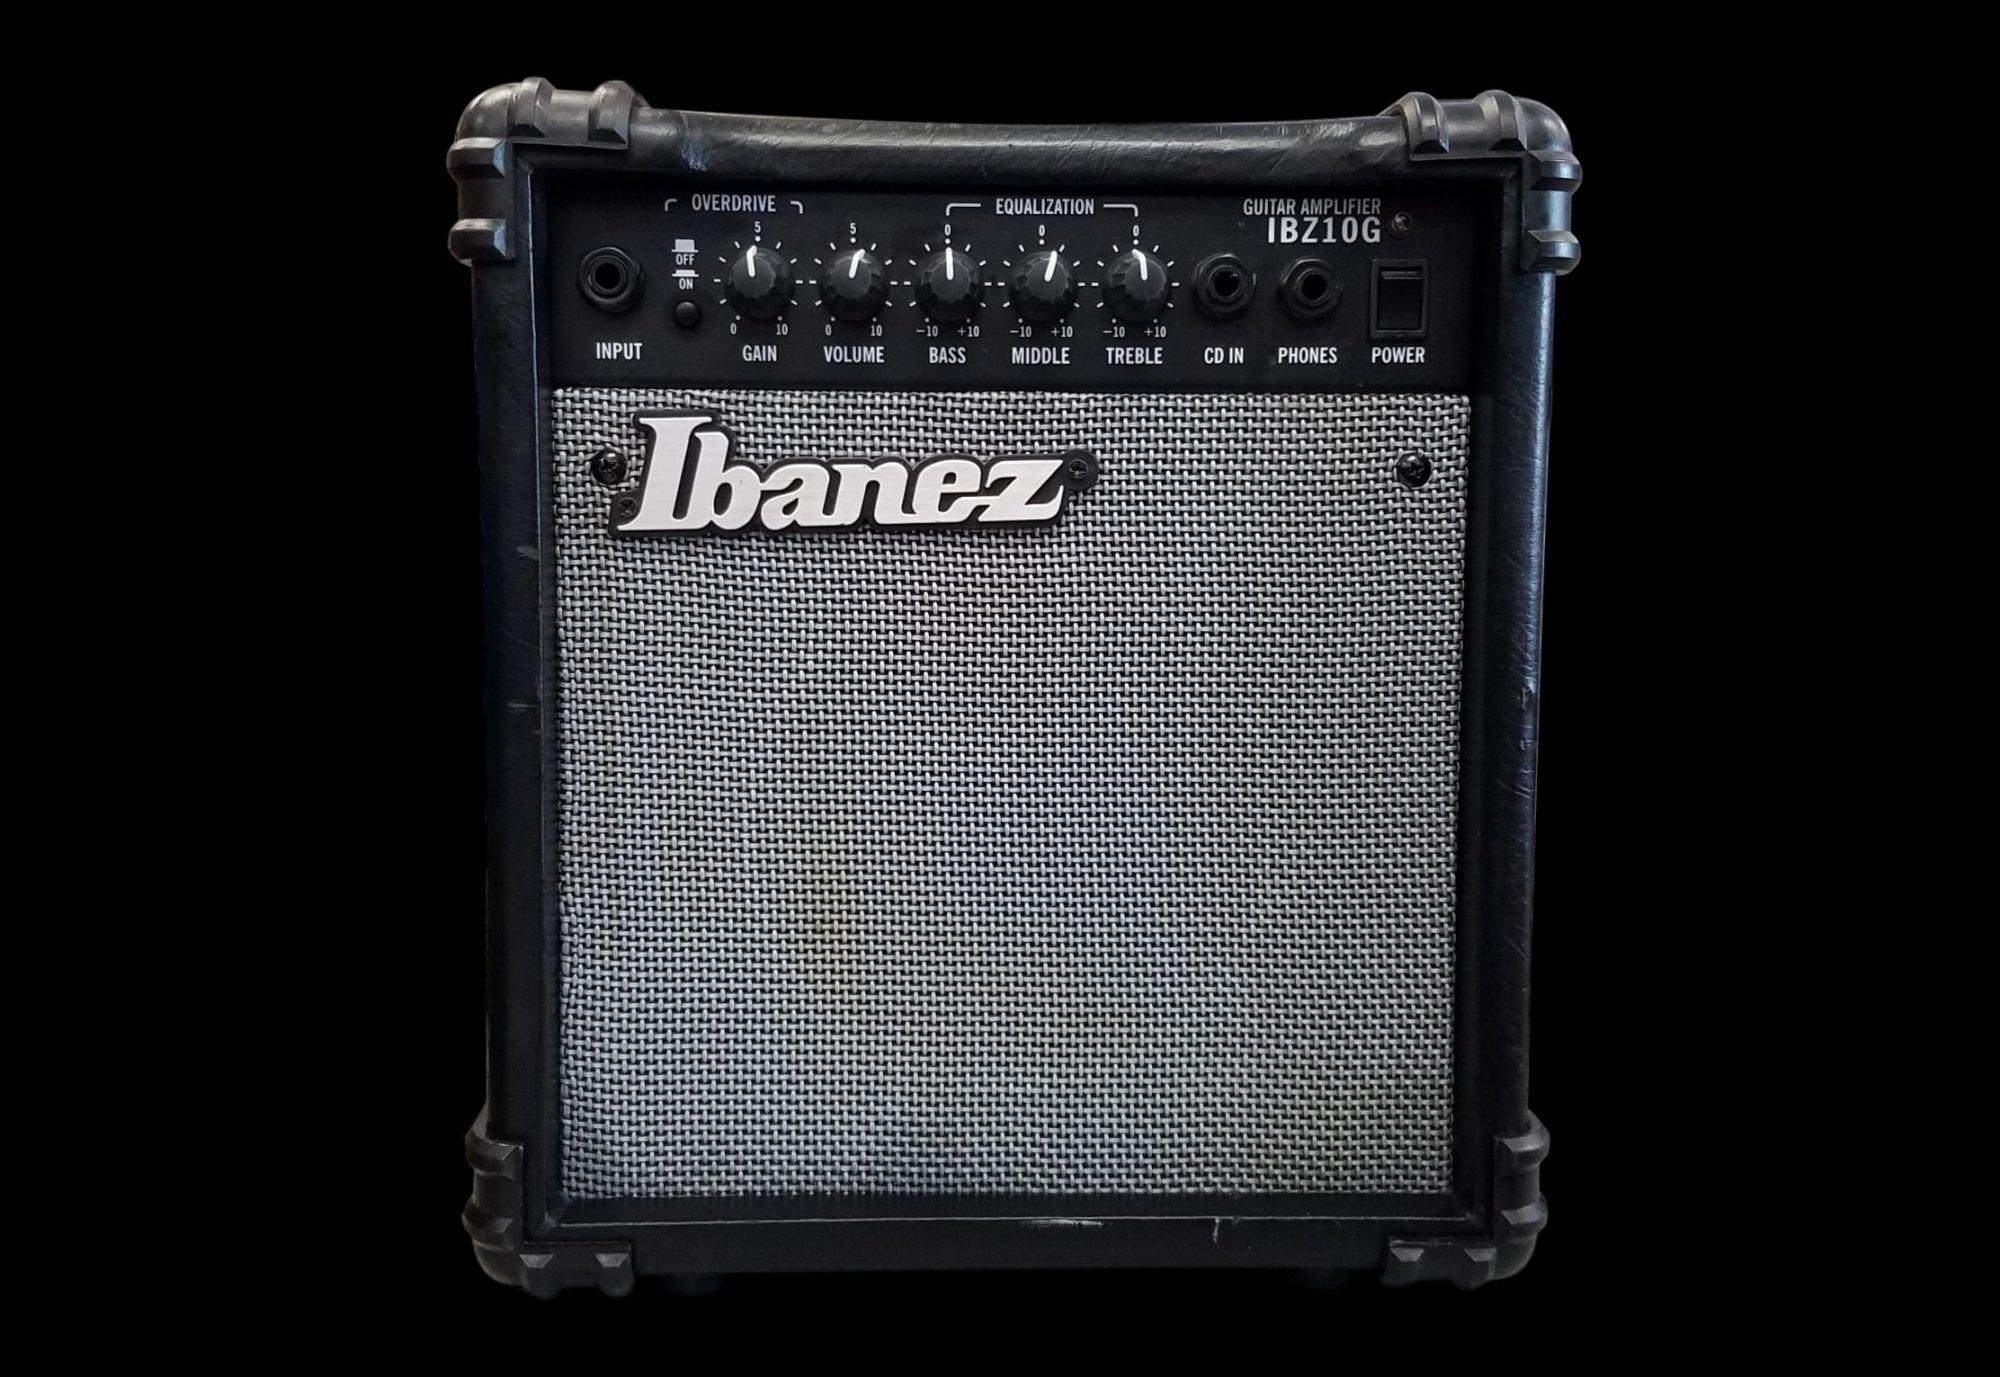 used ibanez ibz10g guitar combo amplifier. Black Bedroom Furniture Sets. Home Design Ideas